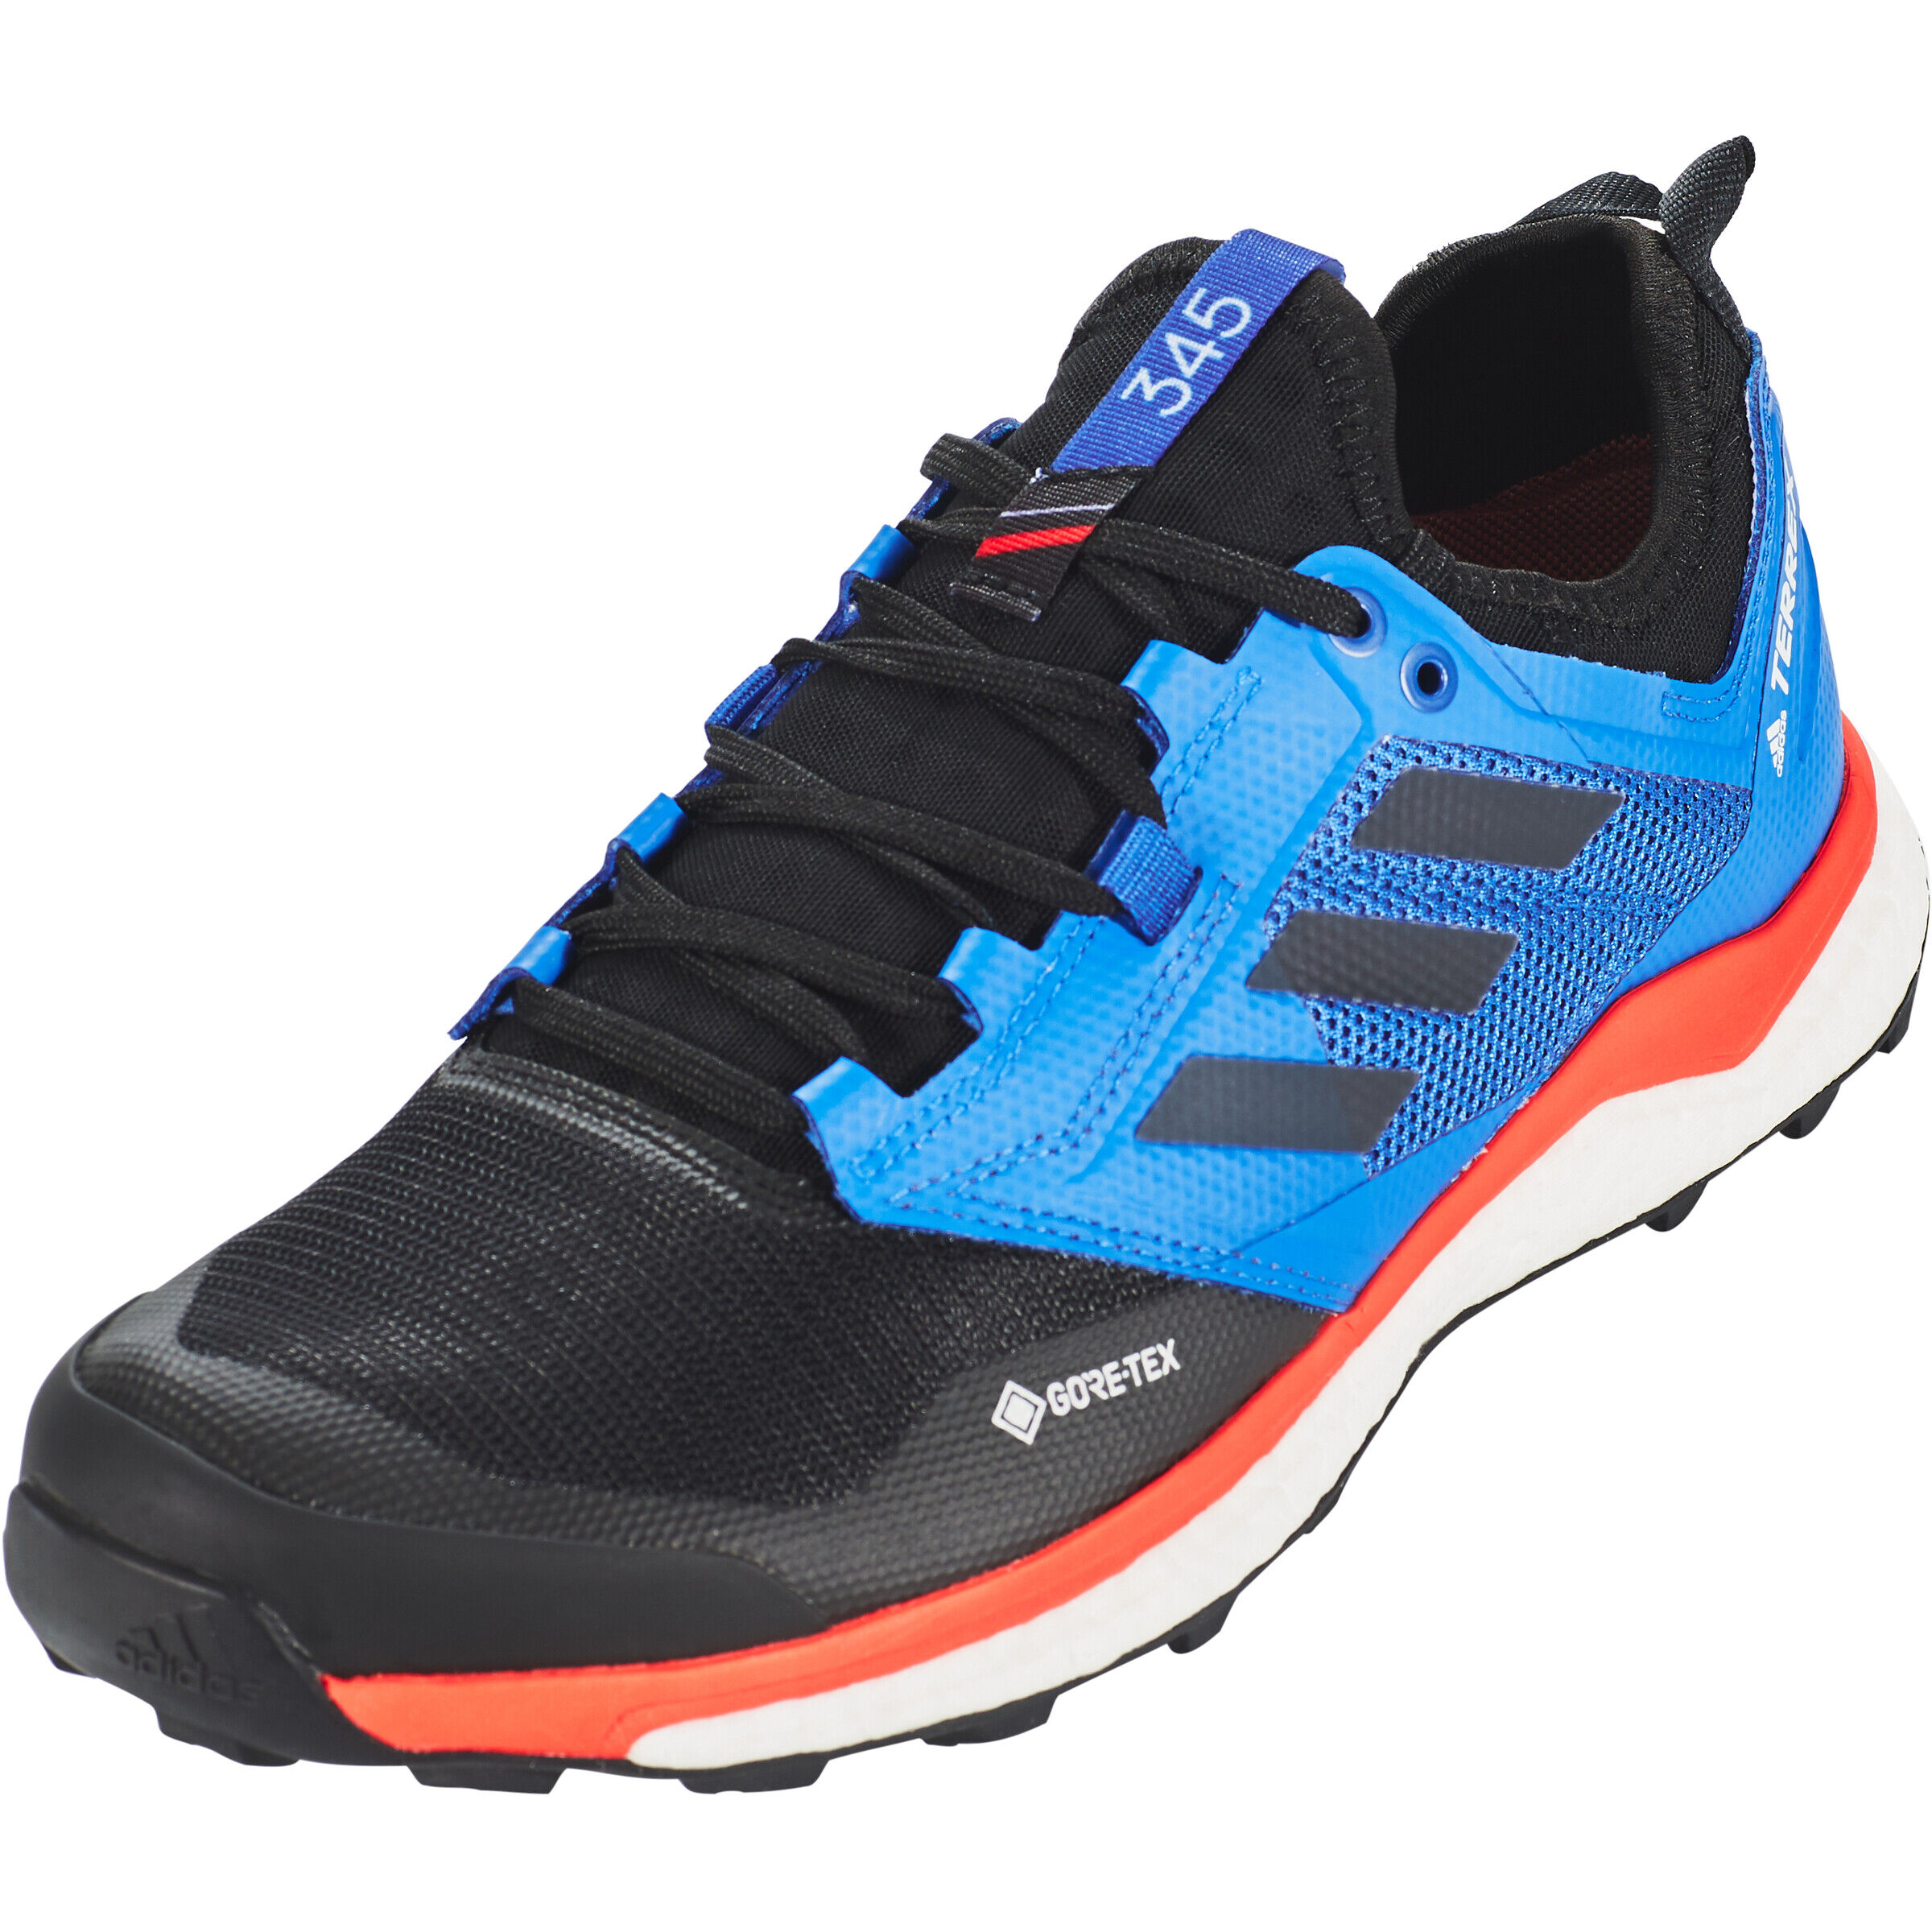 adidas TERREX Agravic XT Gore Tex Trail Running Schuhe Herren core blackgrey fivehi res red